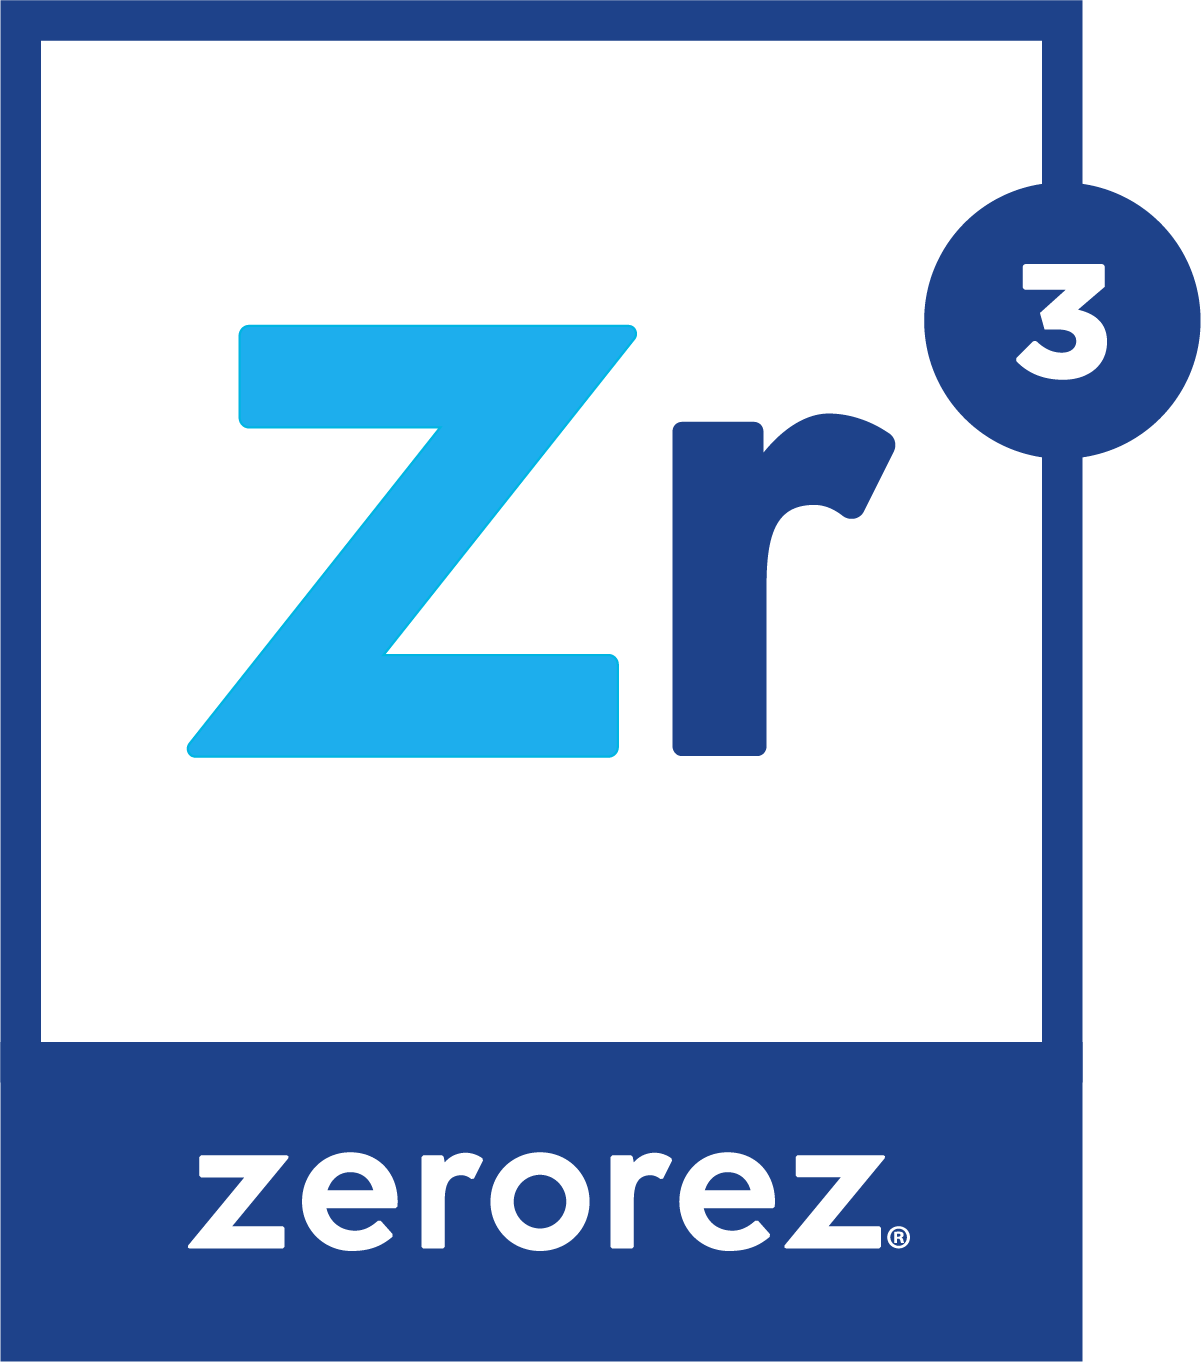 Zerorez Los Angeles/Ventura logo